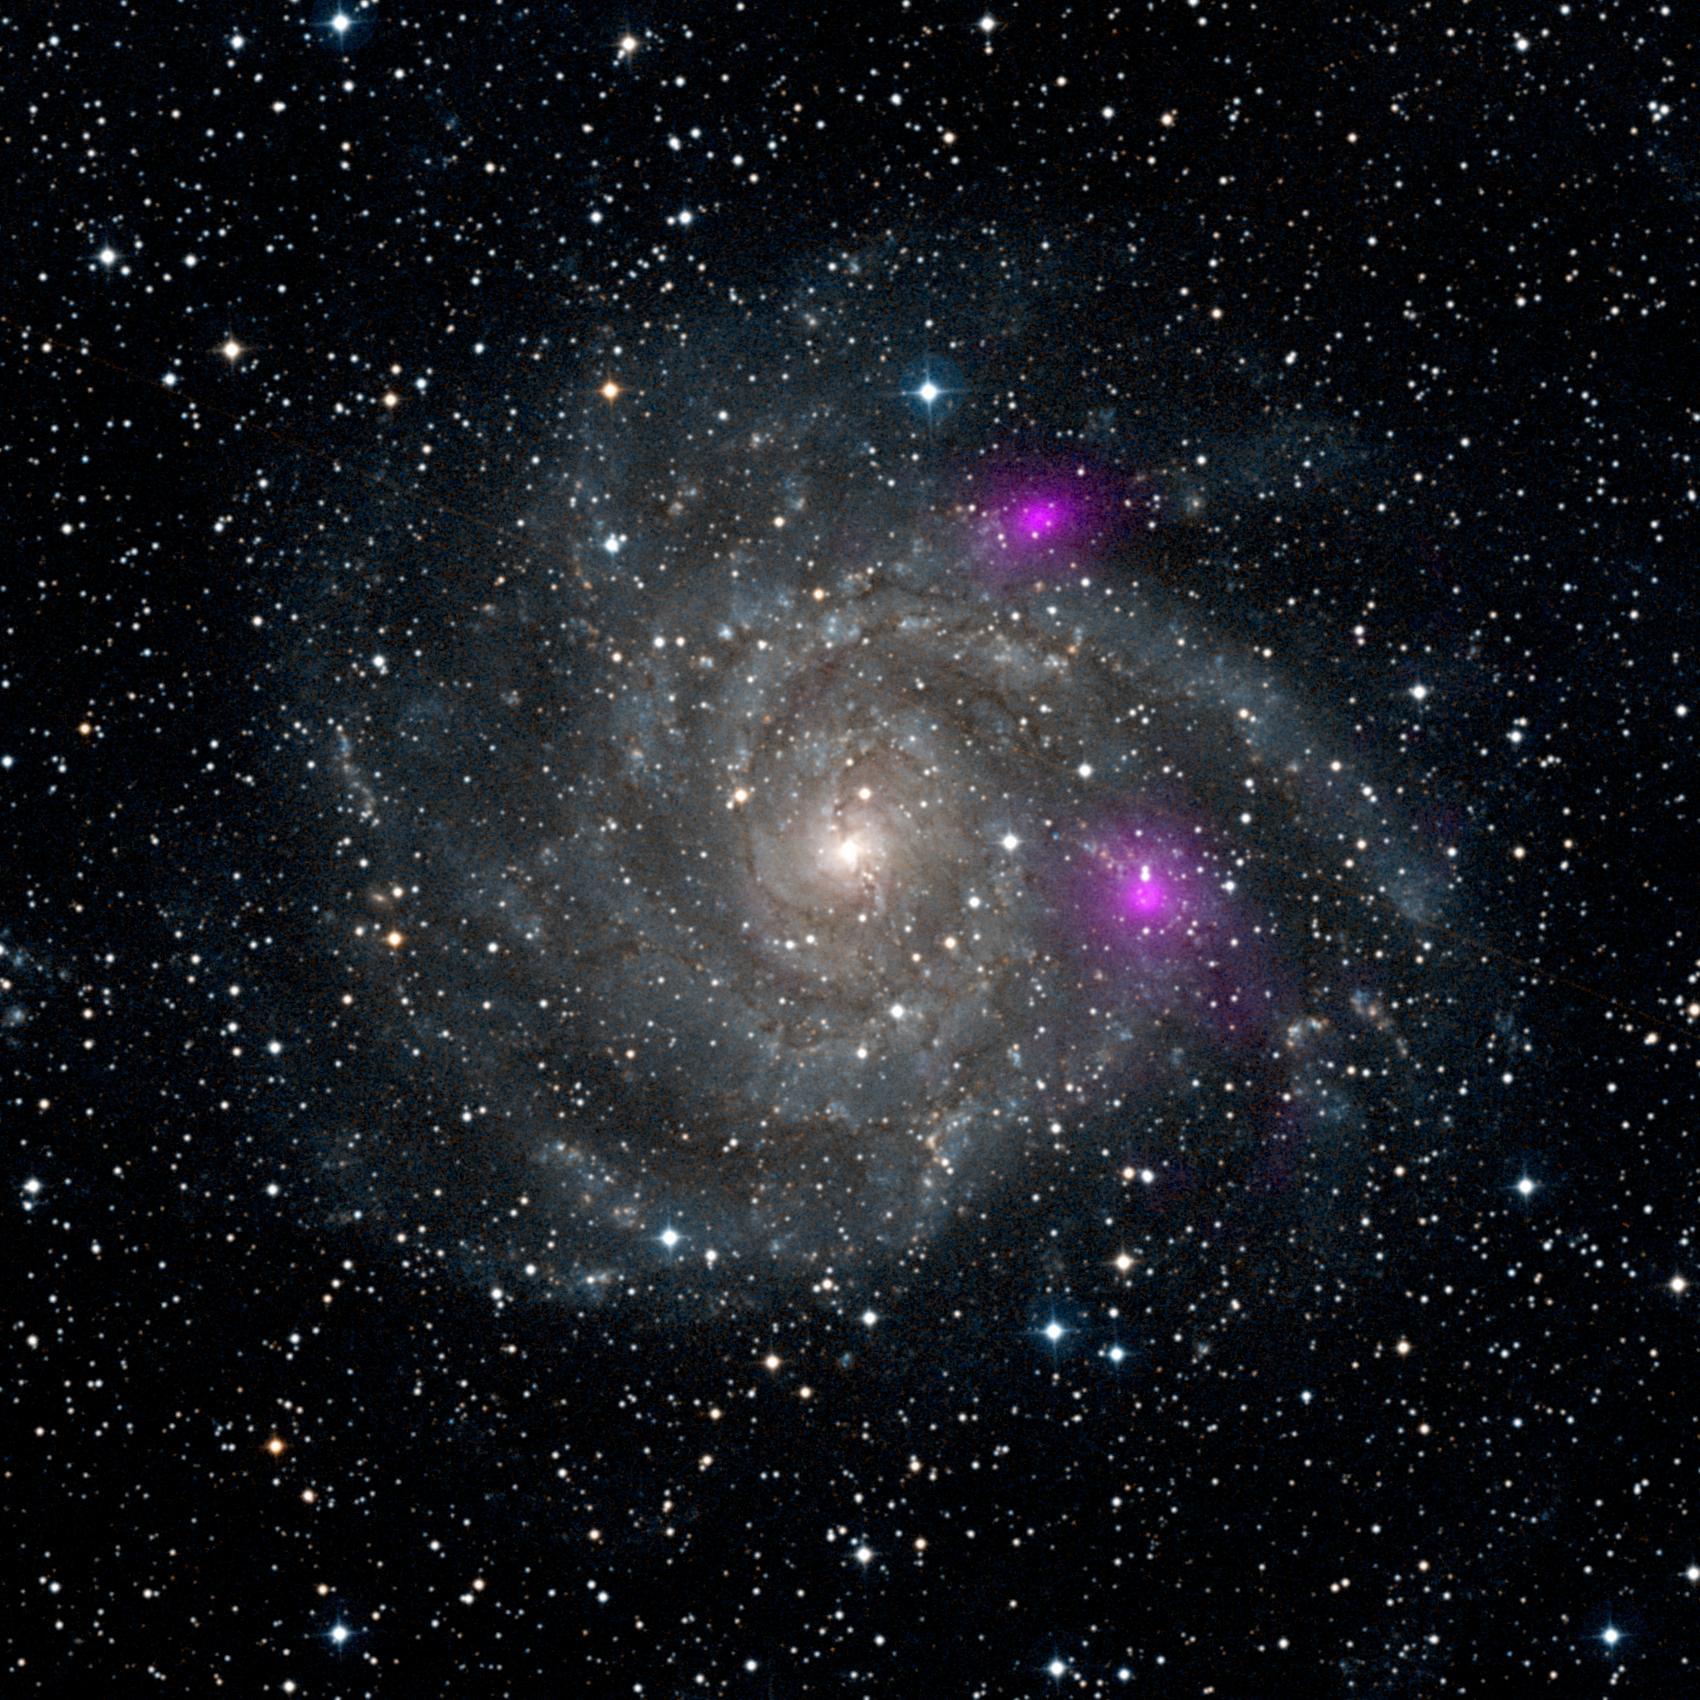 hq galaxy nasa - photo #15